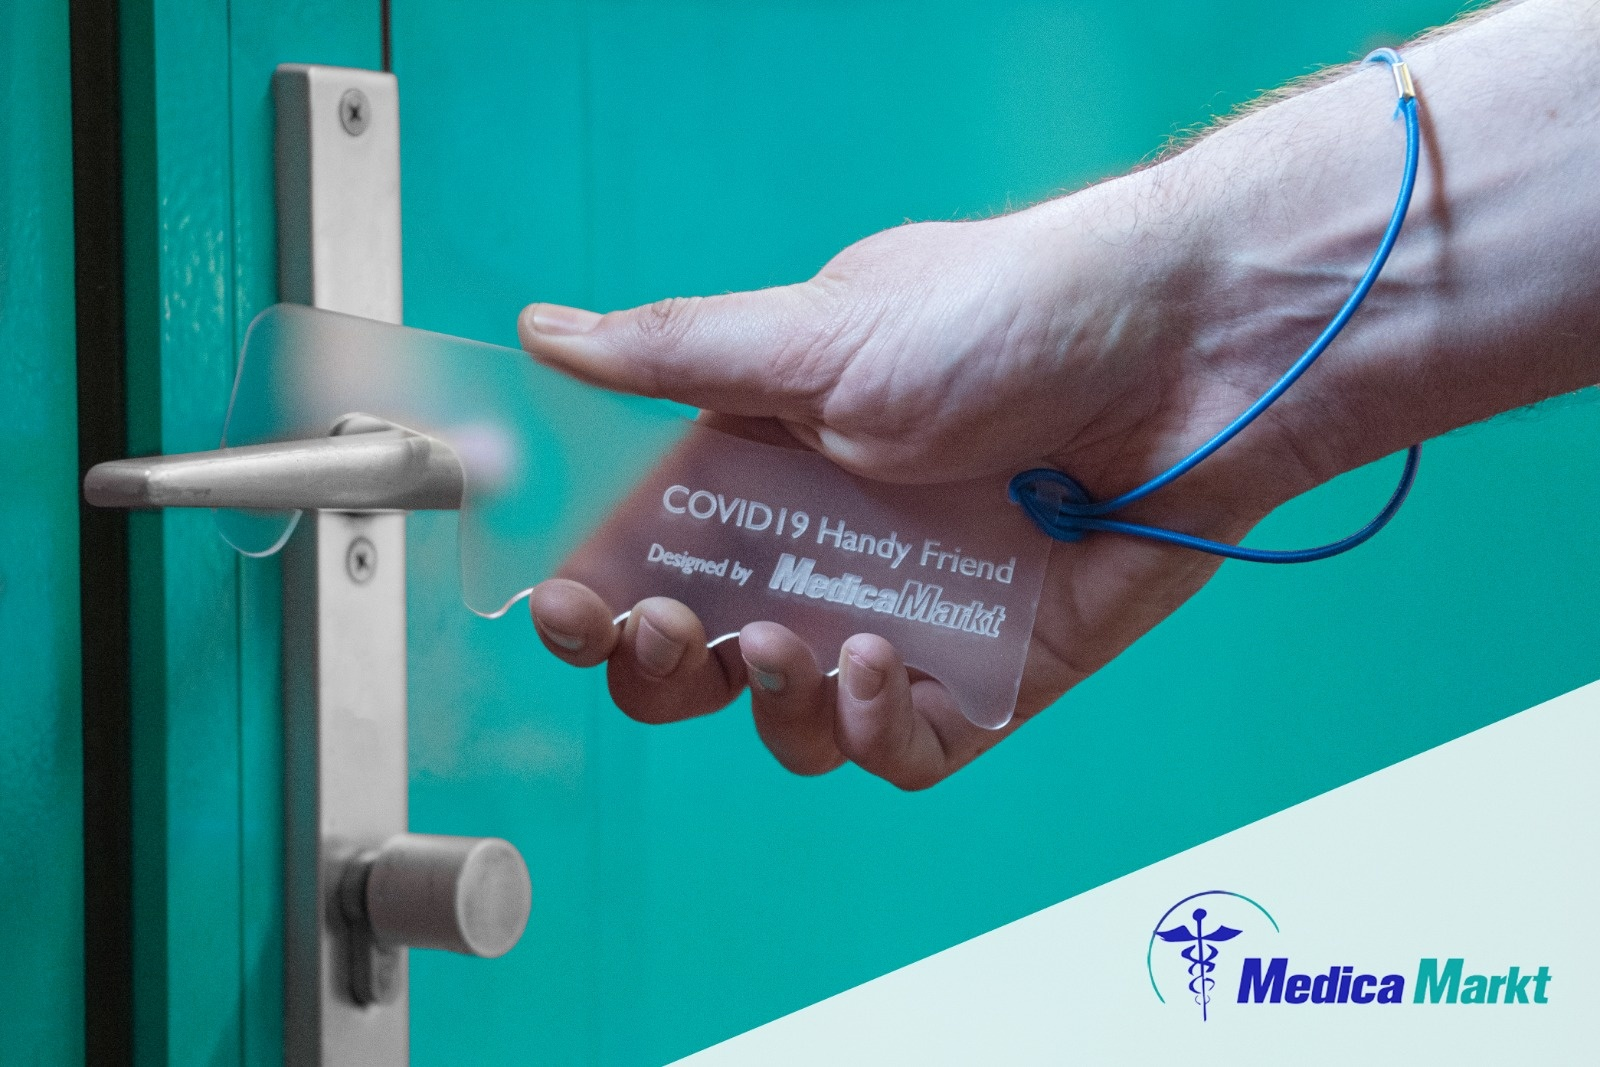 Covid19 Handy Friend contactloos opener